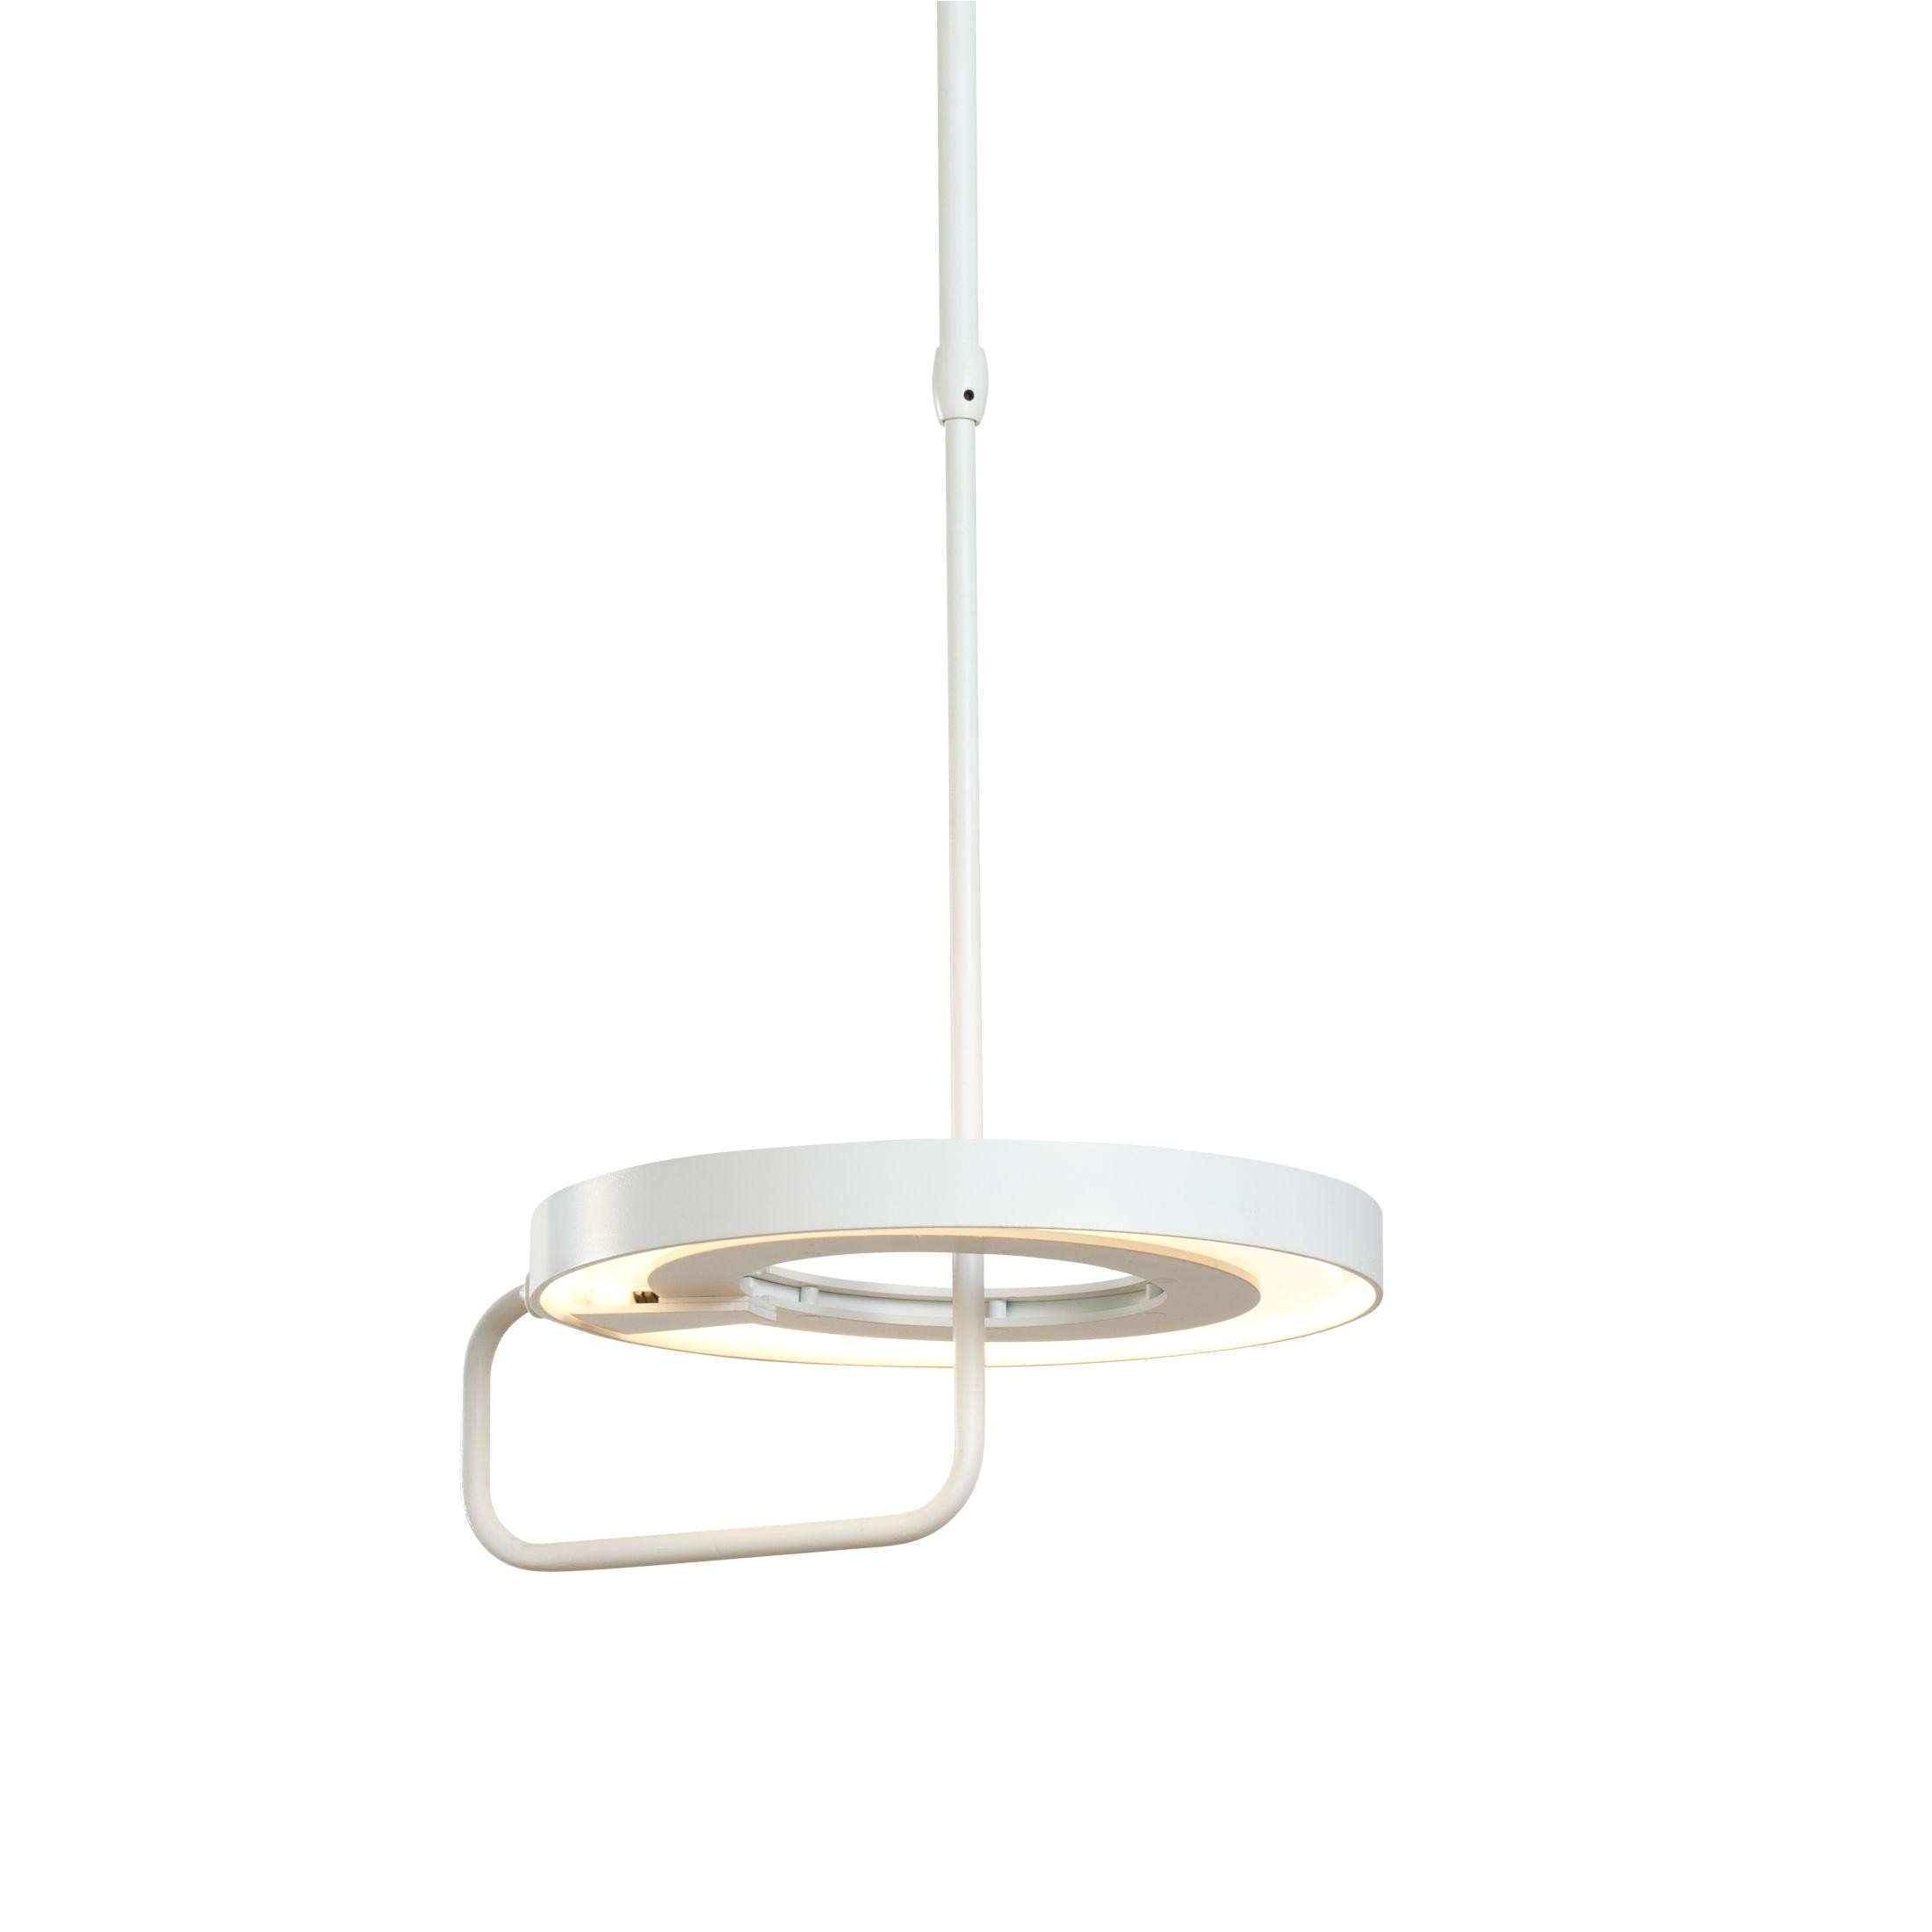 Winsome Bedroom Light Fixtures Within Led Pendant Light Fixtures Unique 16 Gem Ring Chandelier Chb0039 0d